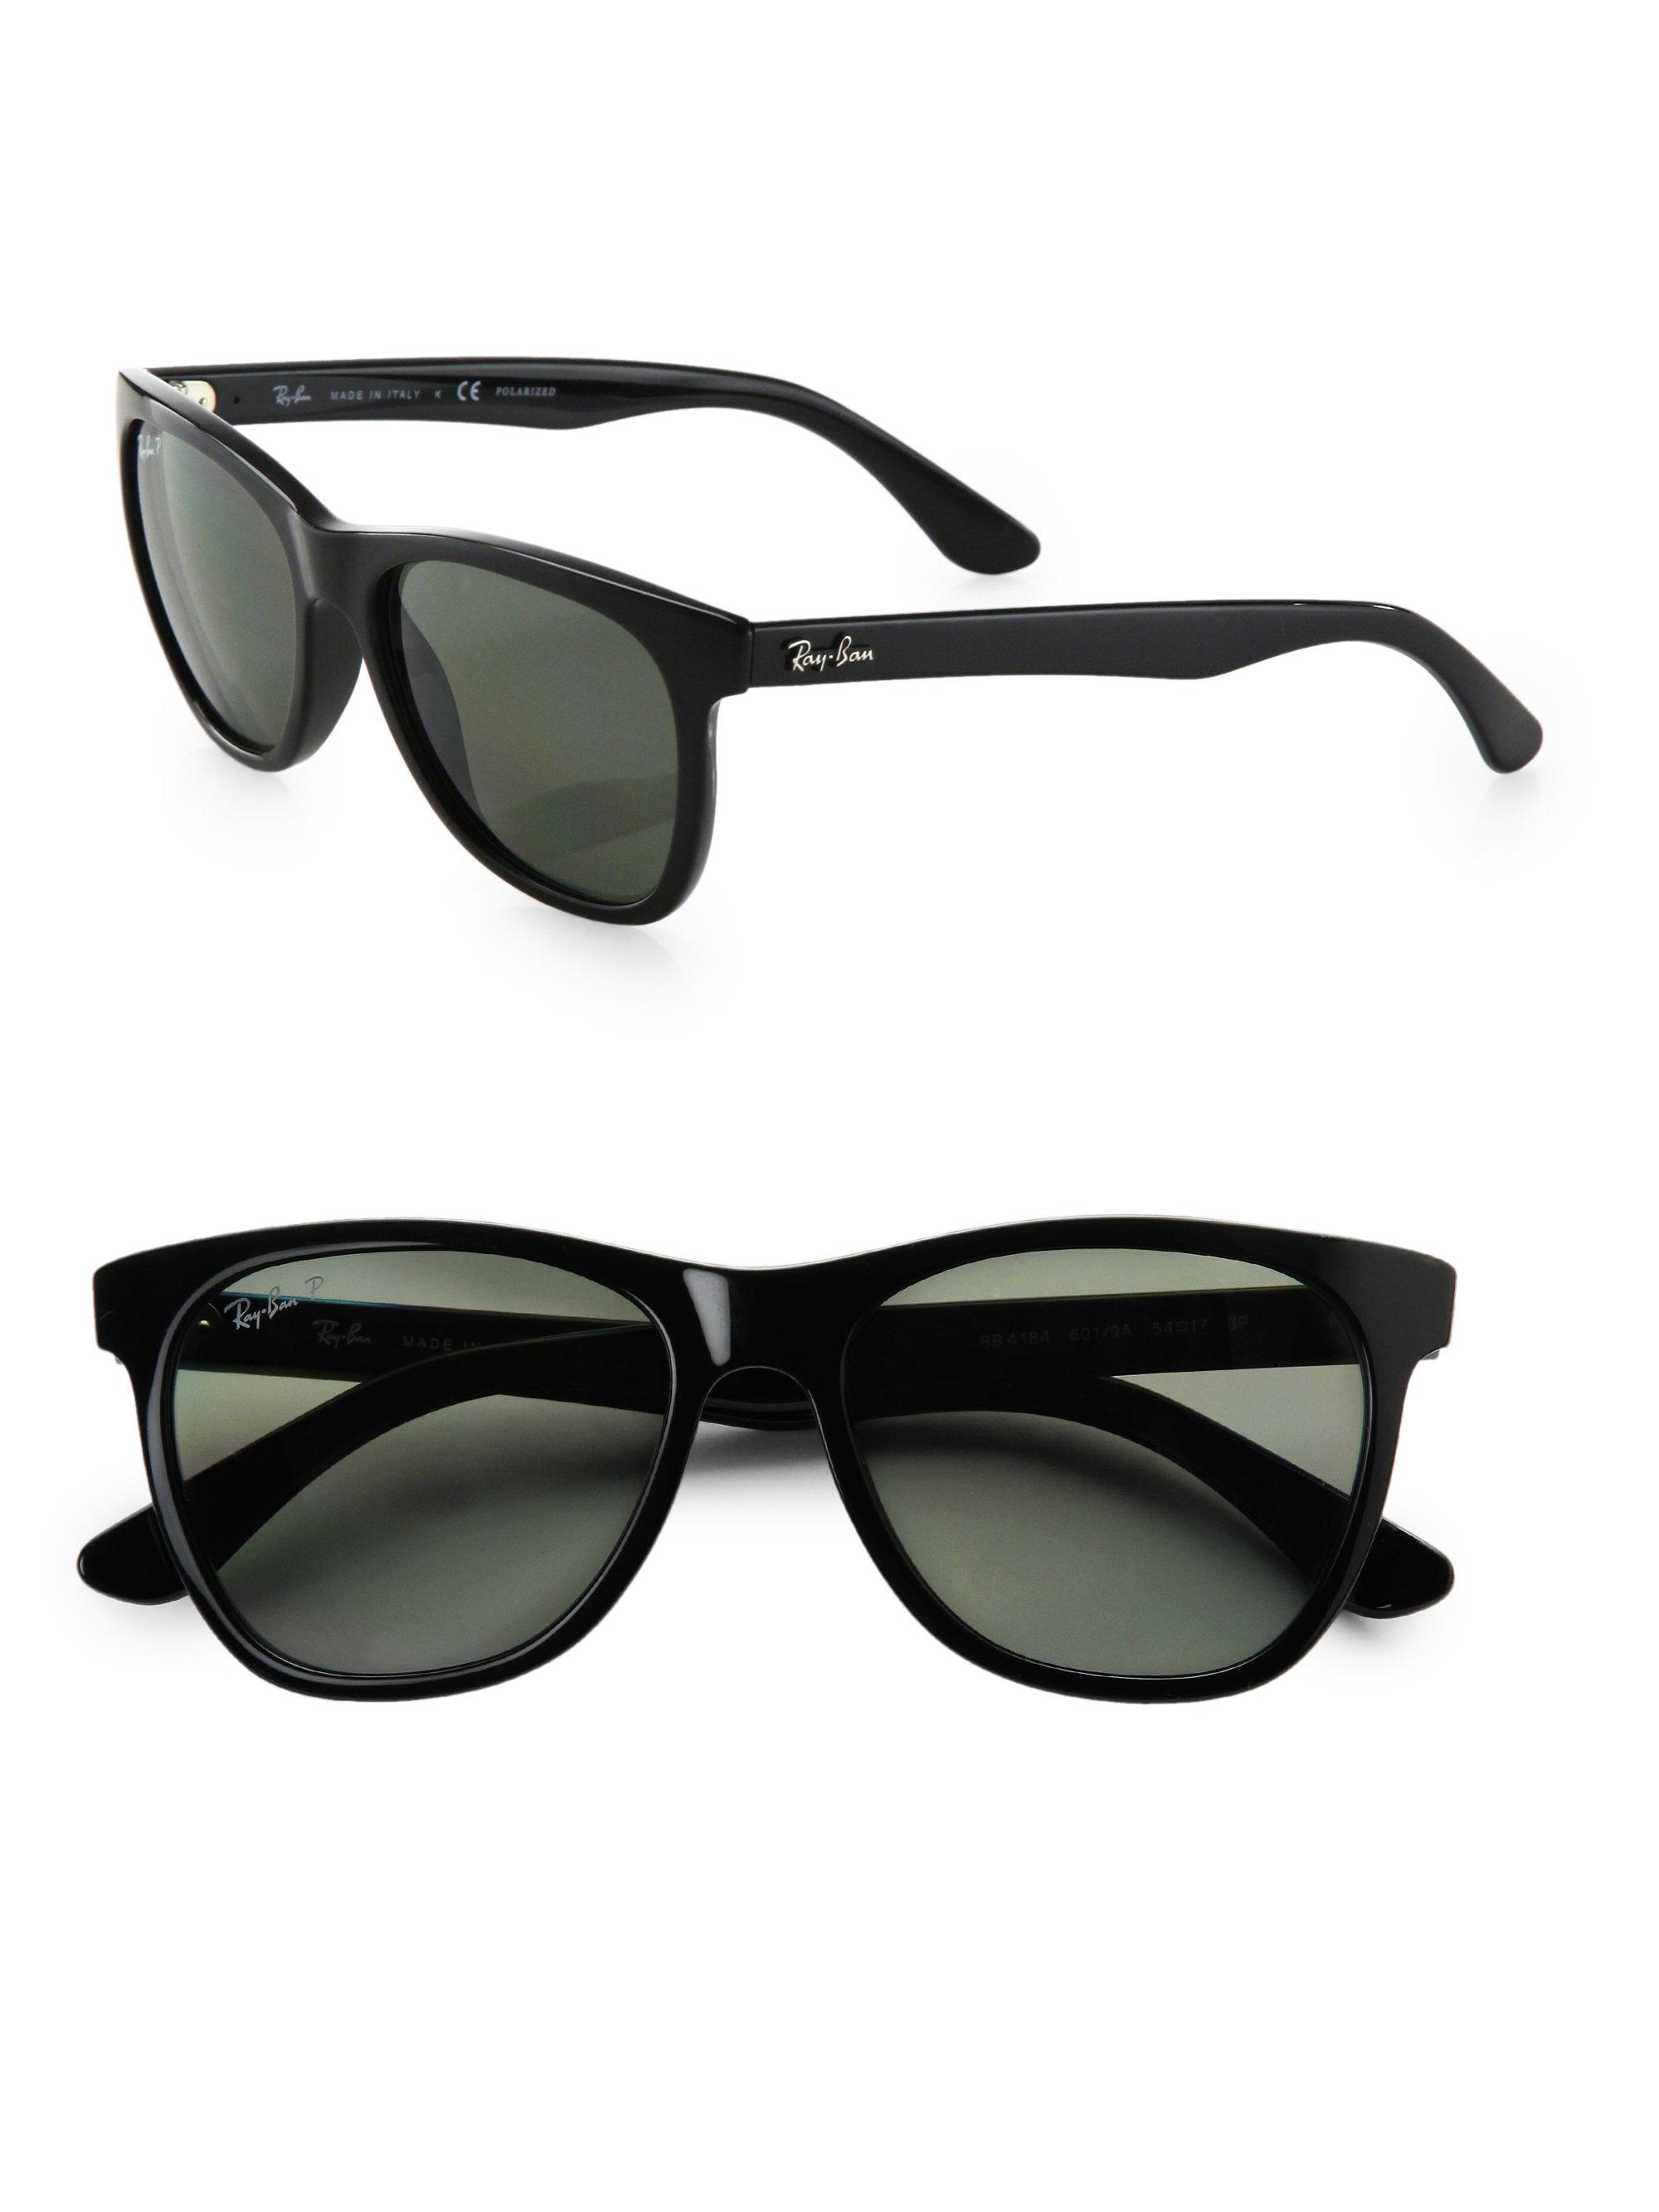 Ray-ban Oversized Plastic Wayfarer Sunglasses in Black | Lyst